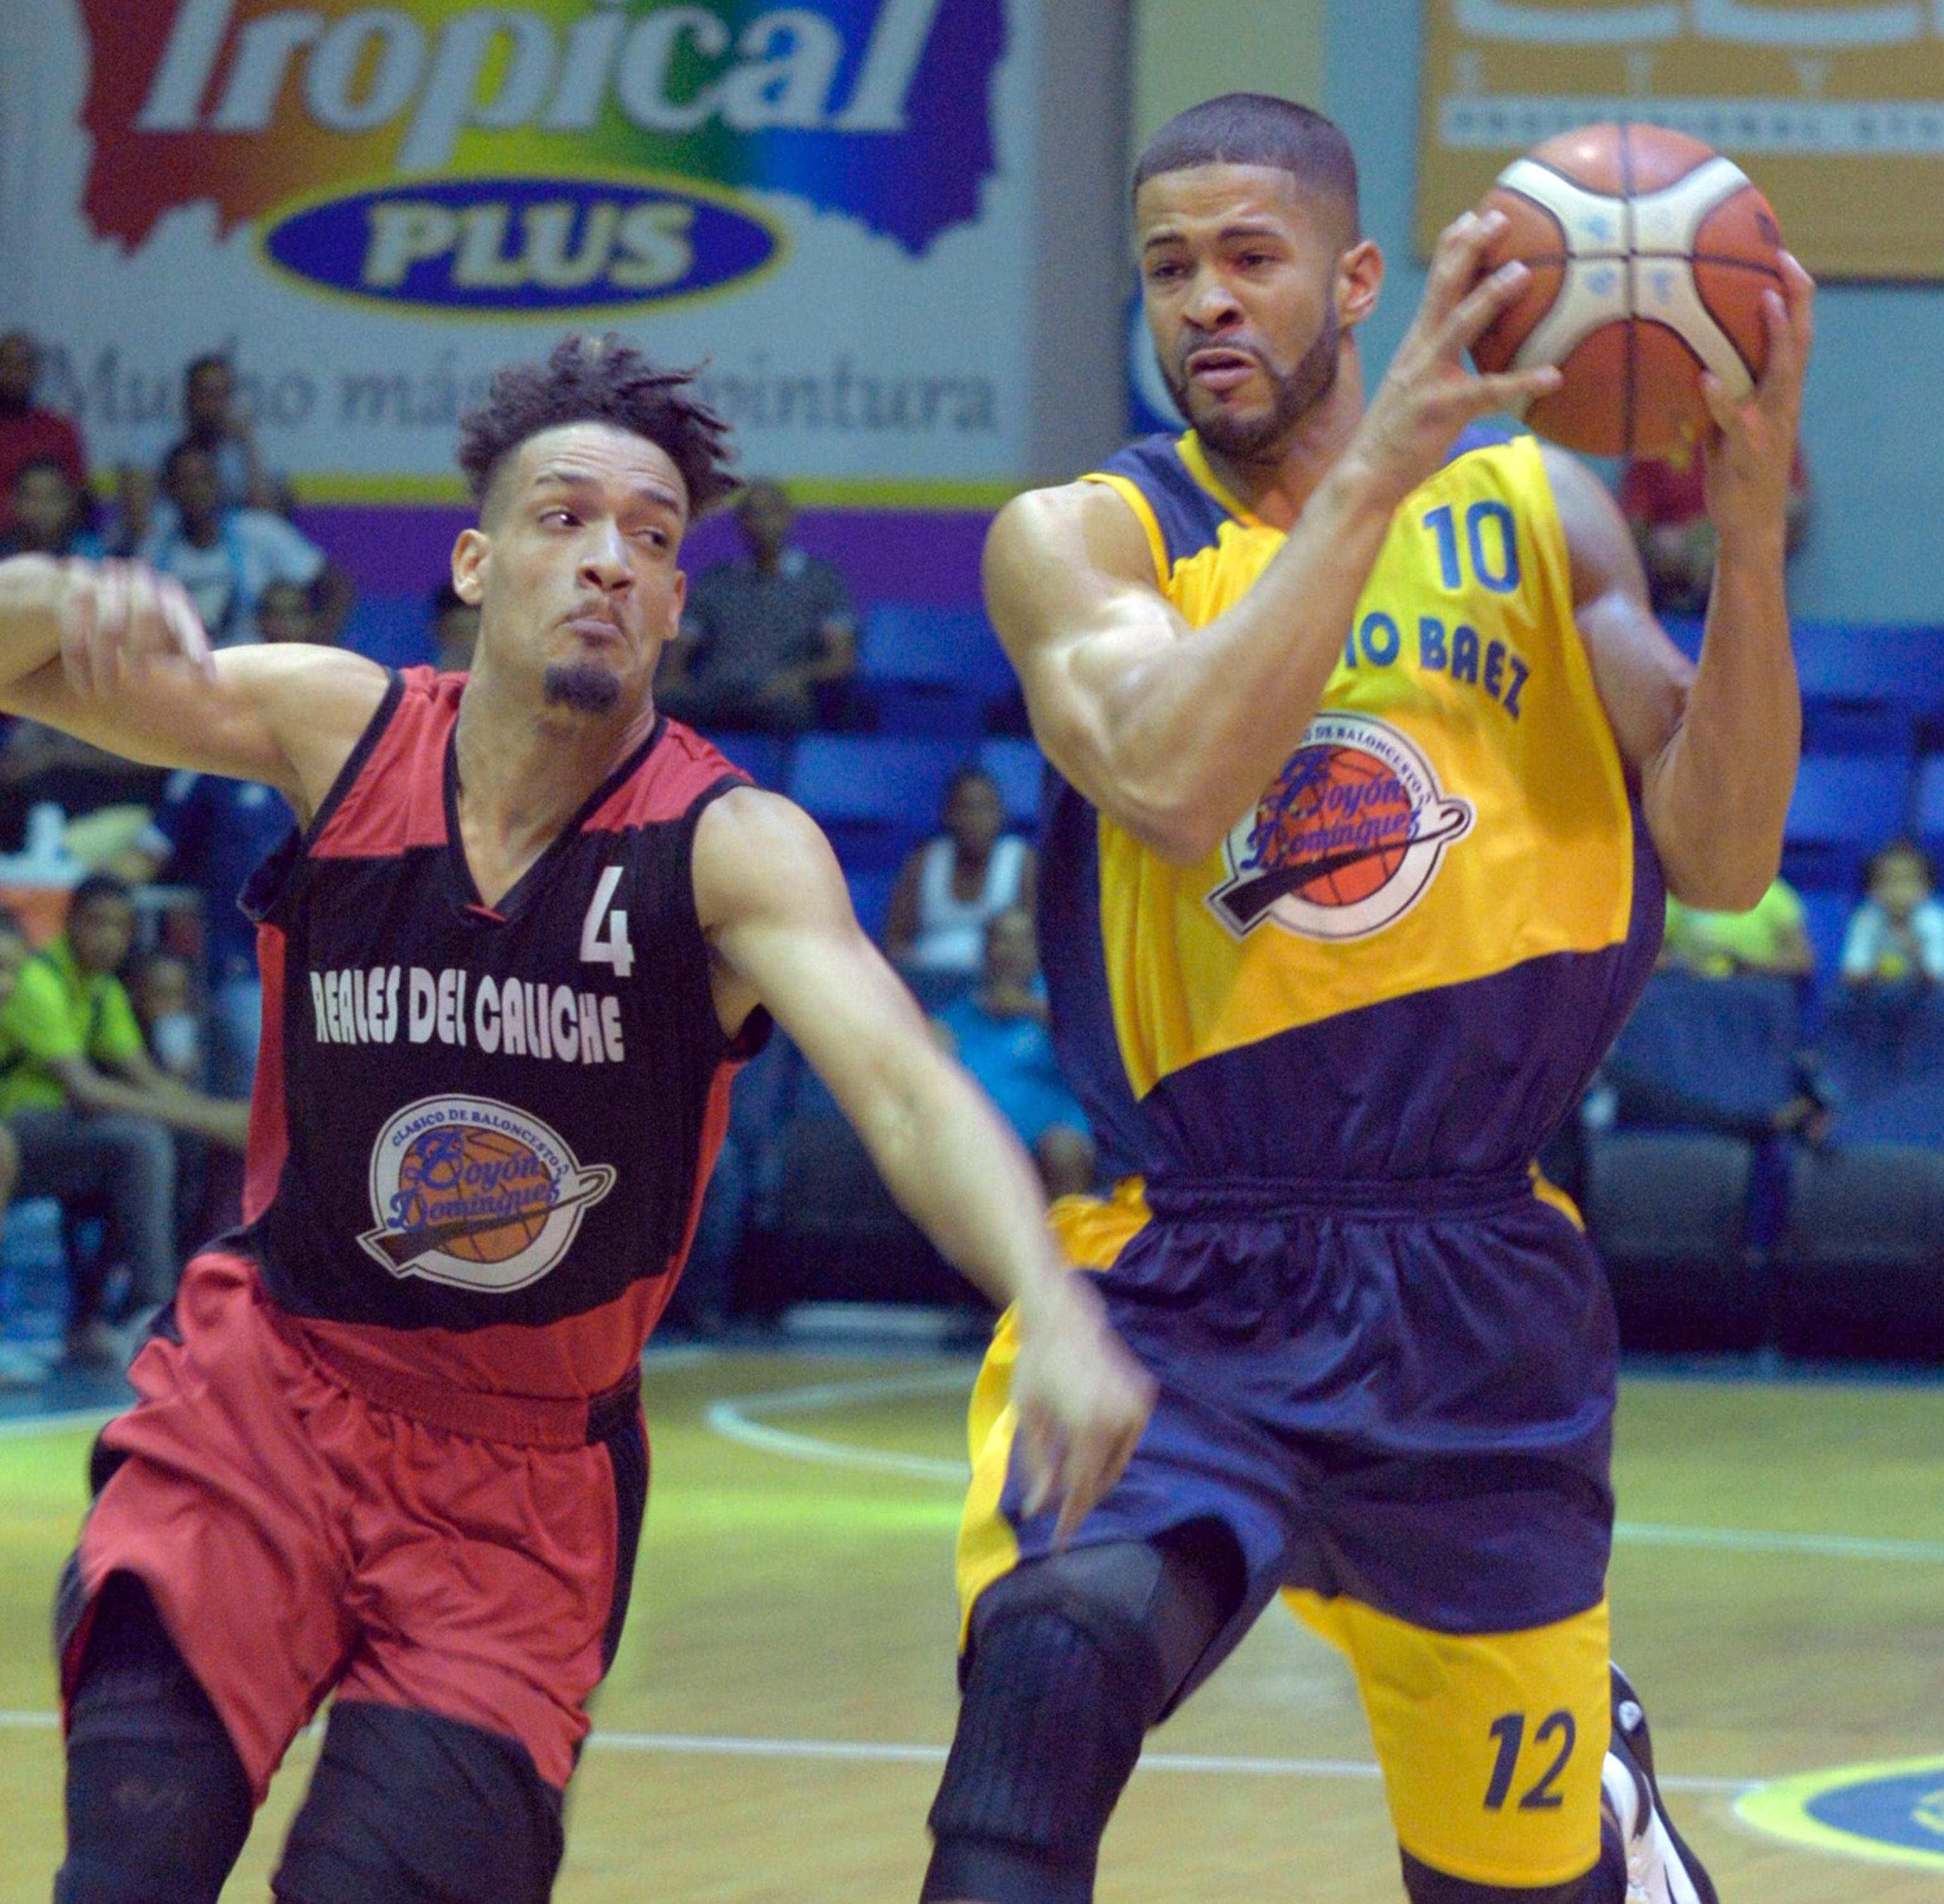 Mauricio Báez avanza en Clásico basket Boyón Domínguez